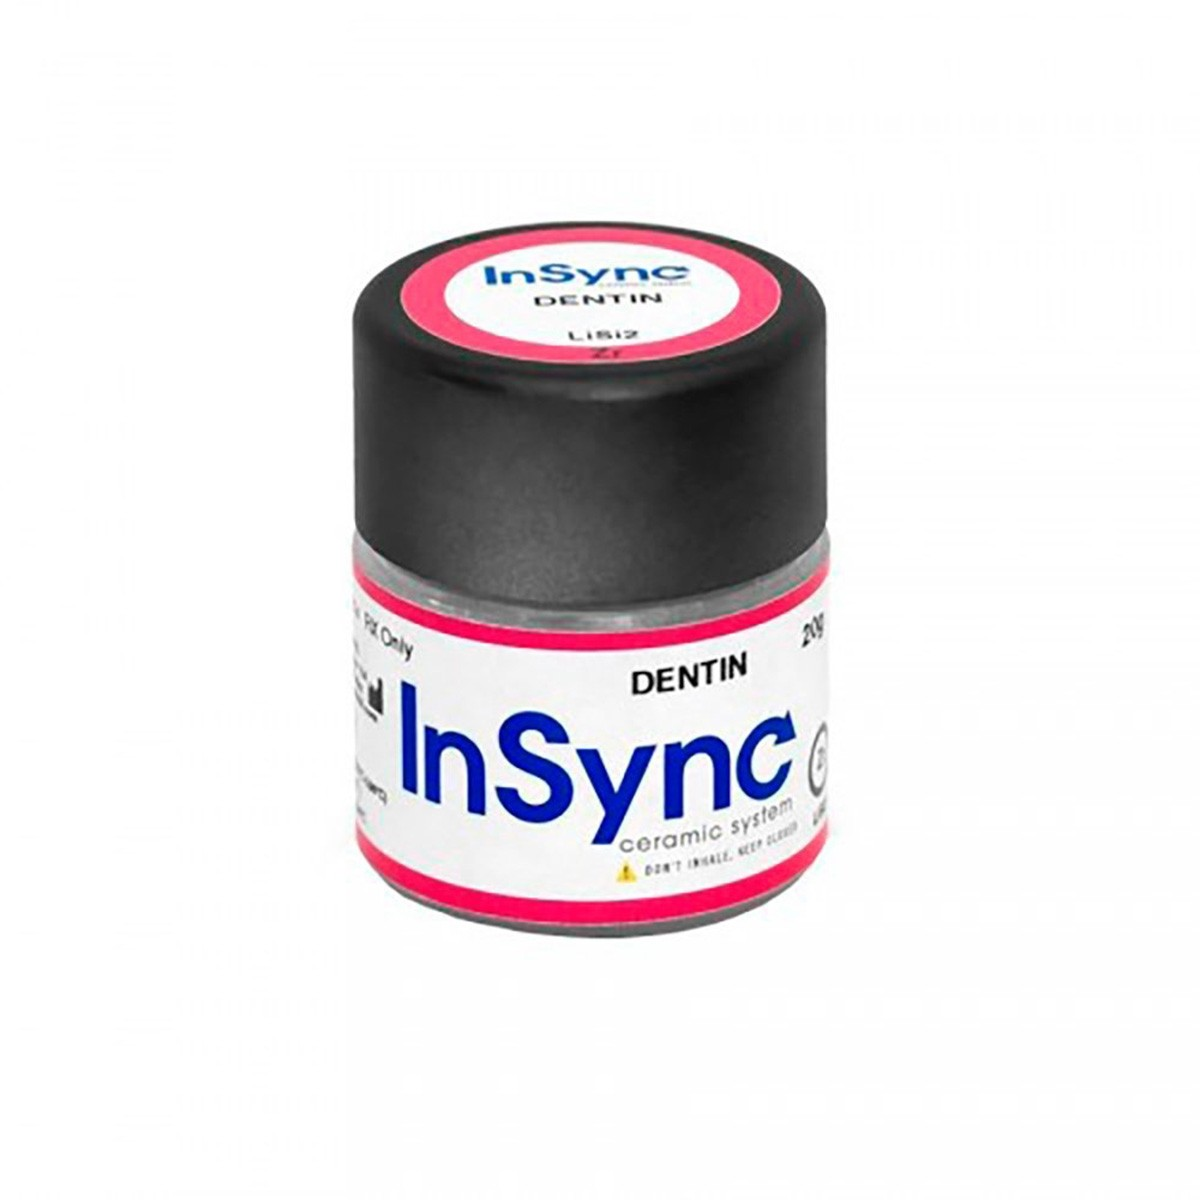 Cerâmica Insync Dentina 20g